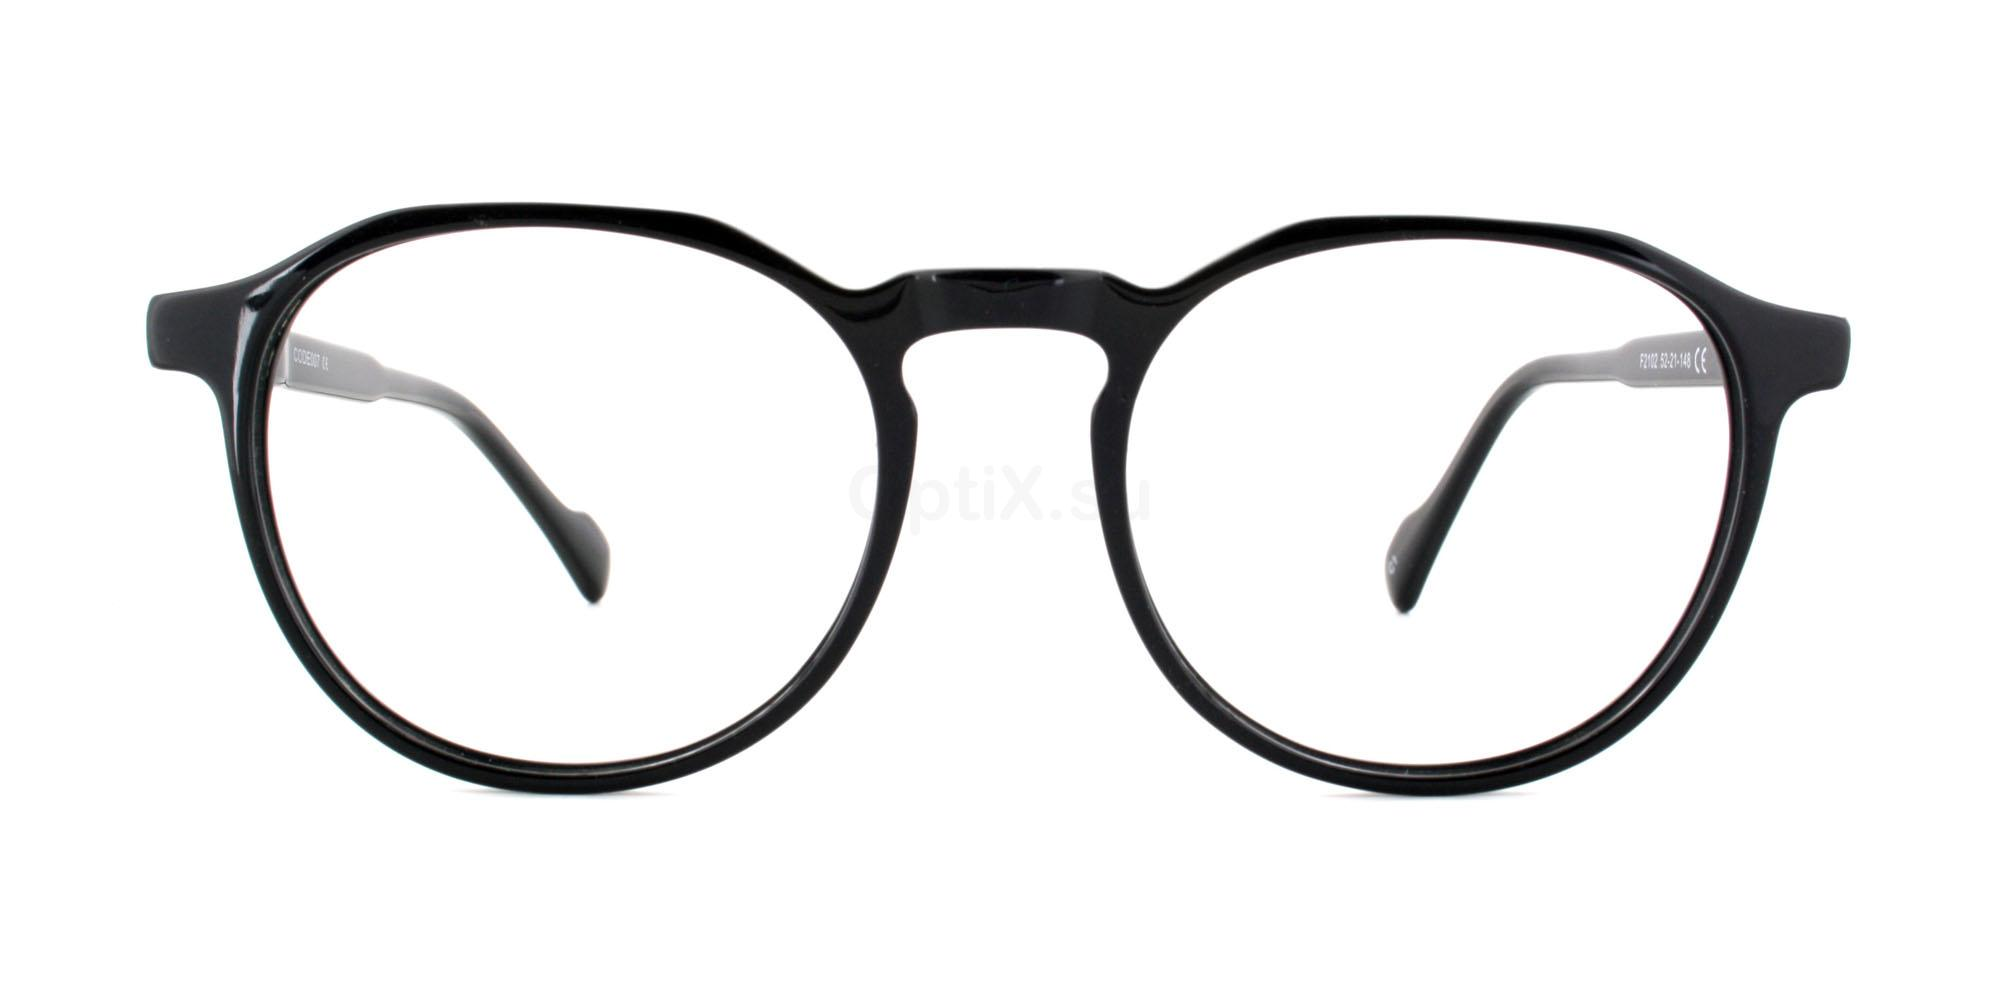 C1 A2102 Glasses, SelectSpecs